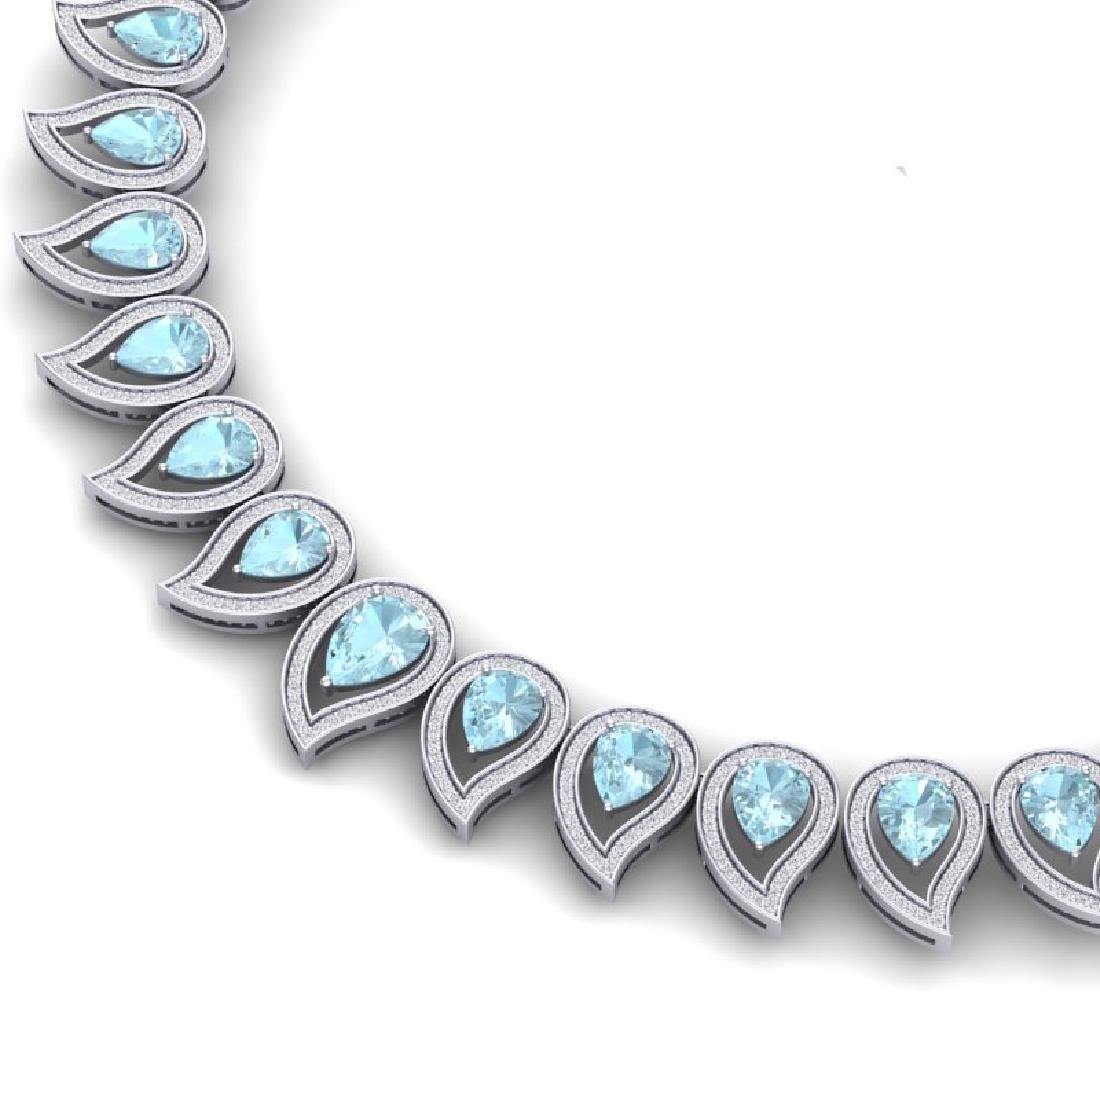 34.96 CTW Royalty Sky Topaz & VS Diamond Necklace 18K - 2